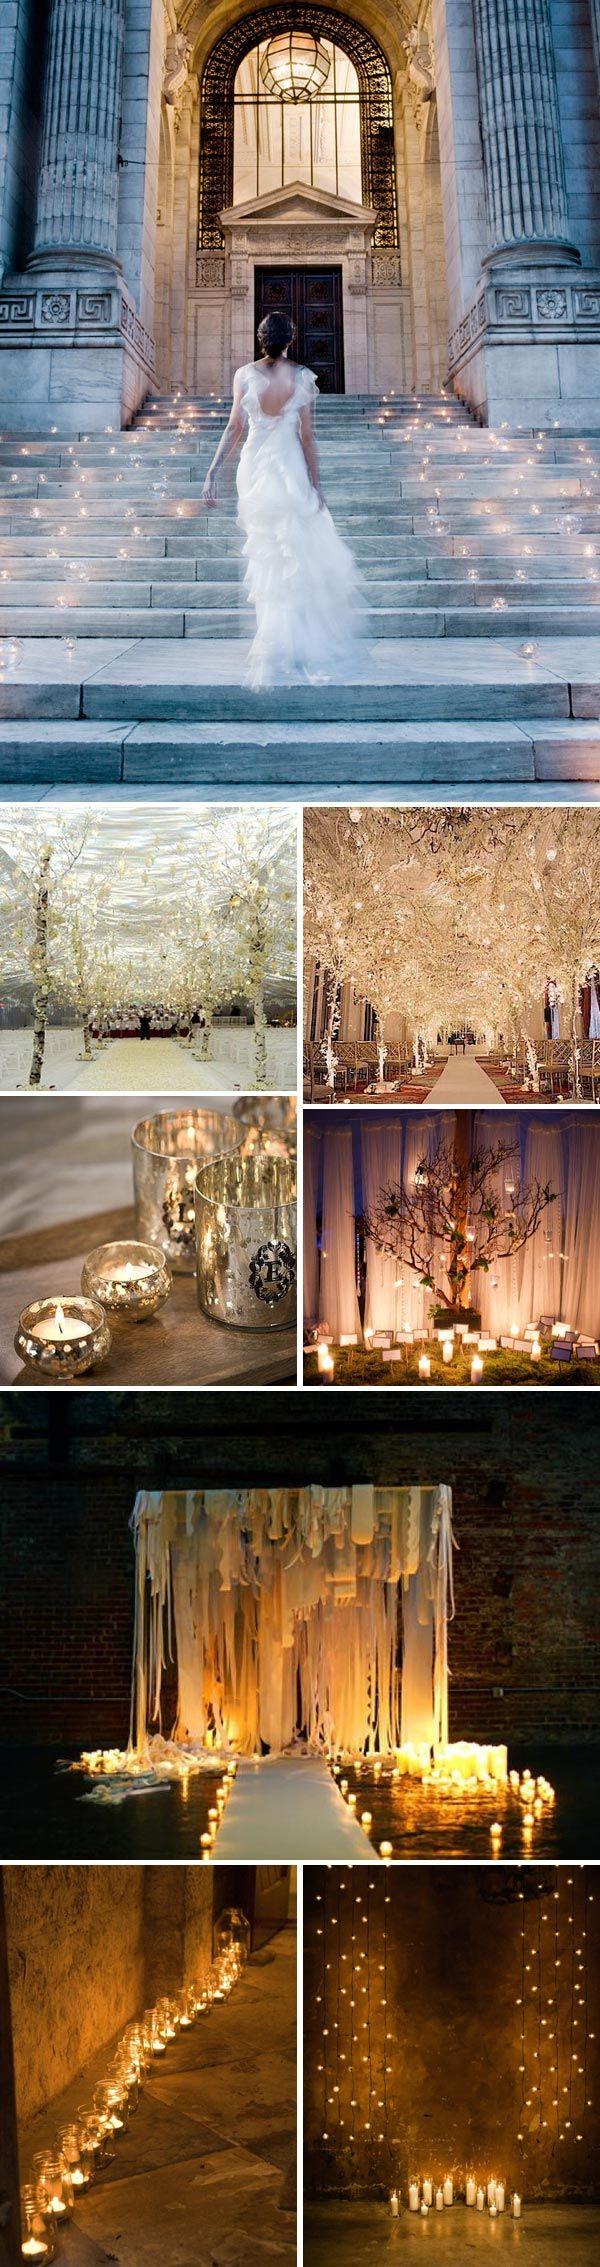 AMAZING lighting ideas for wedding!